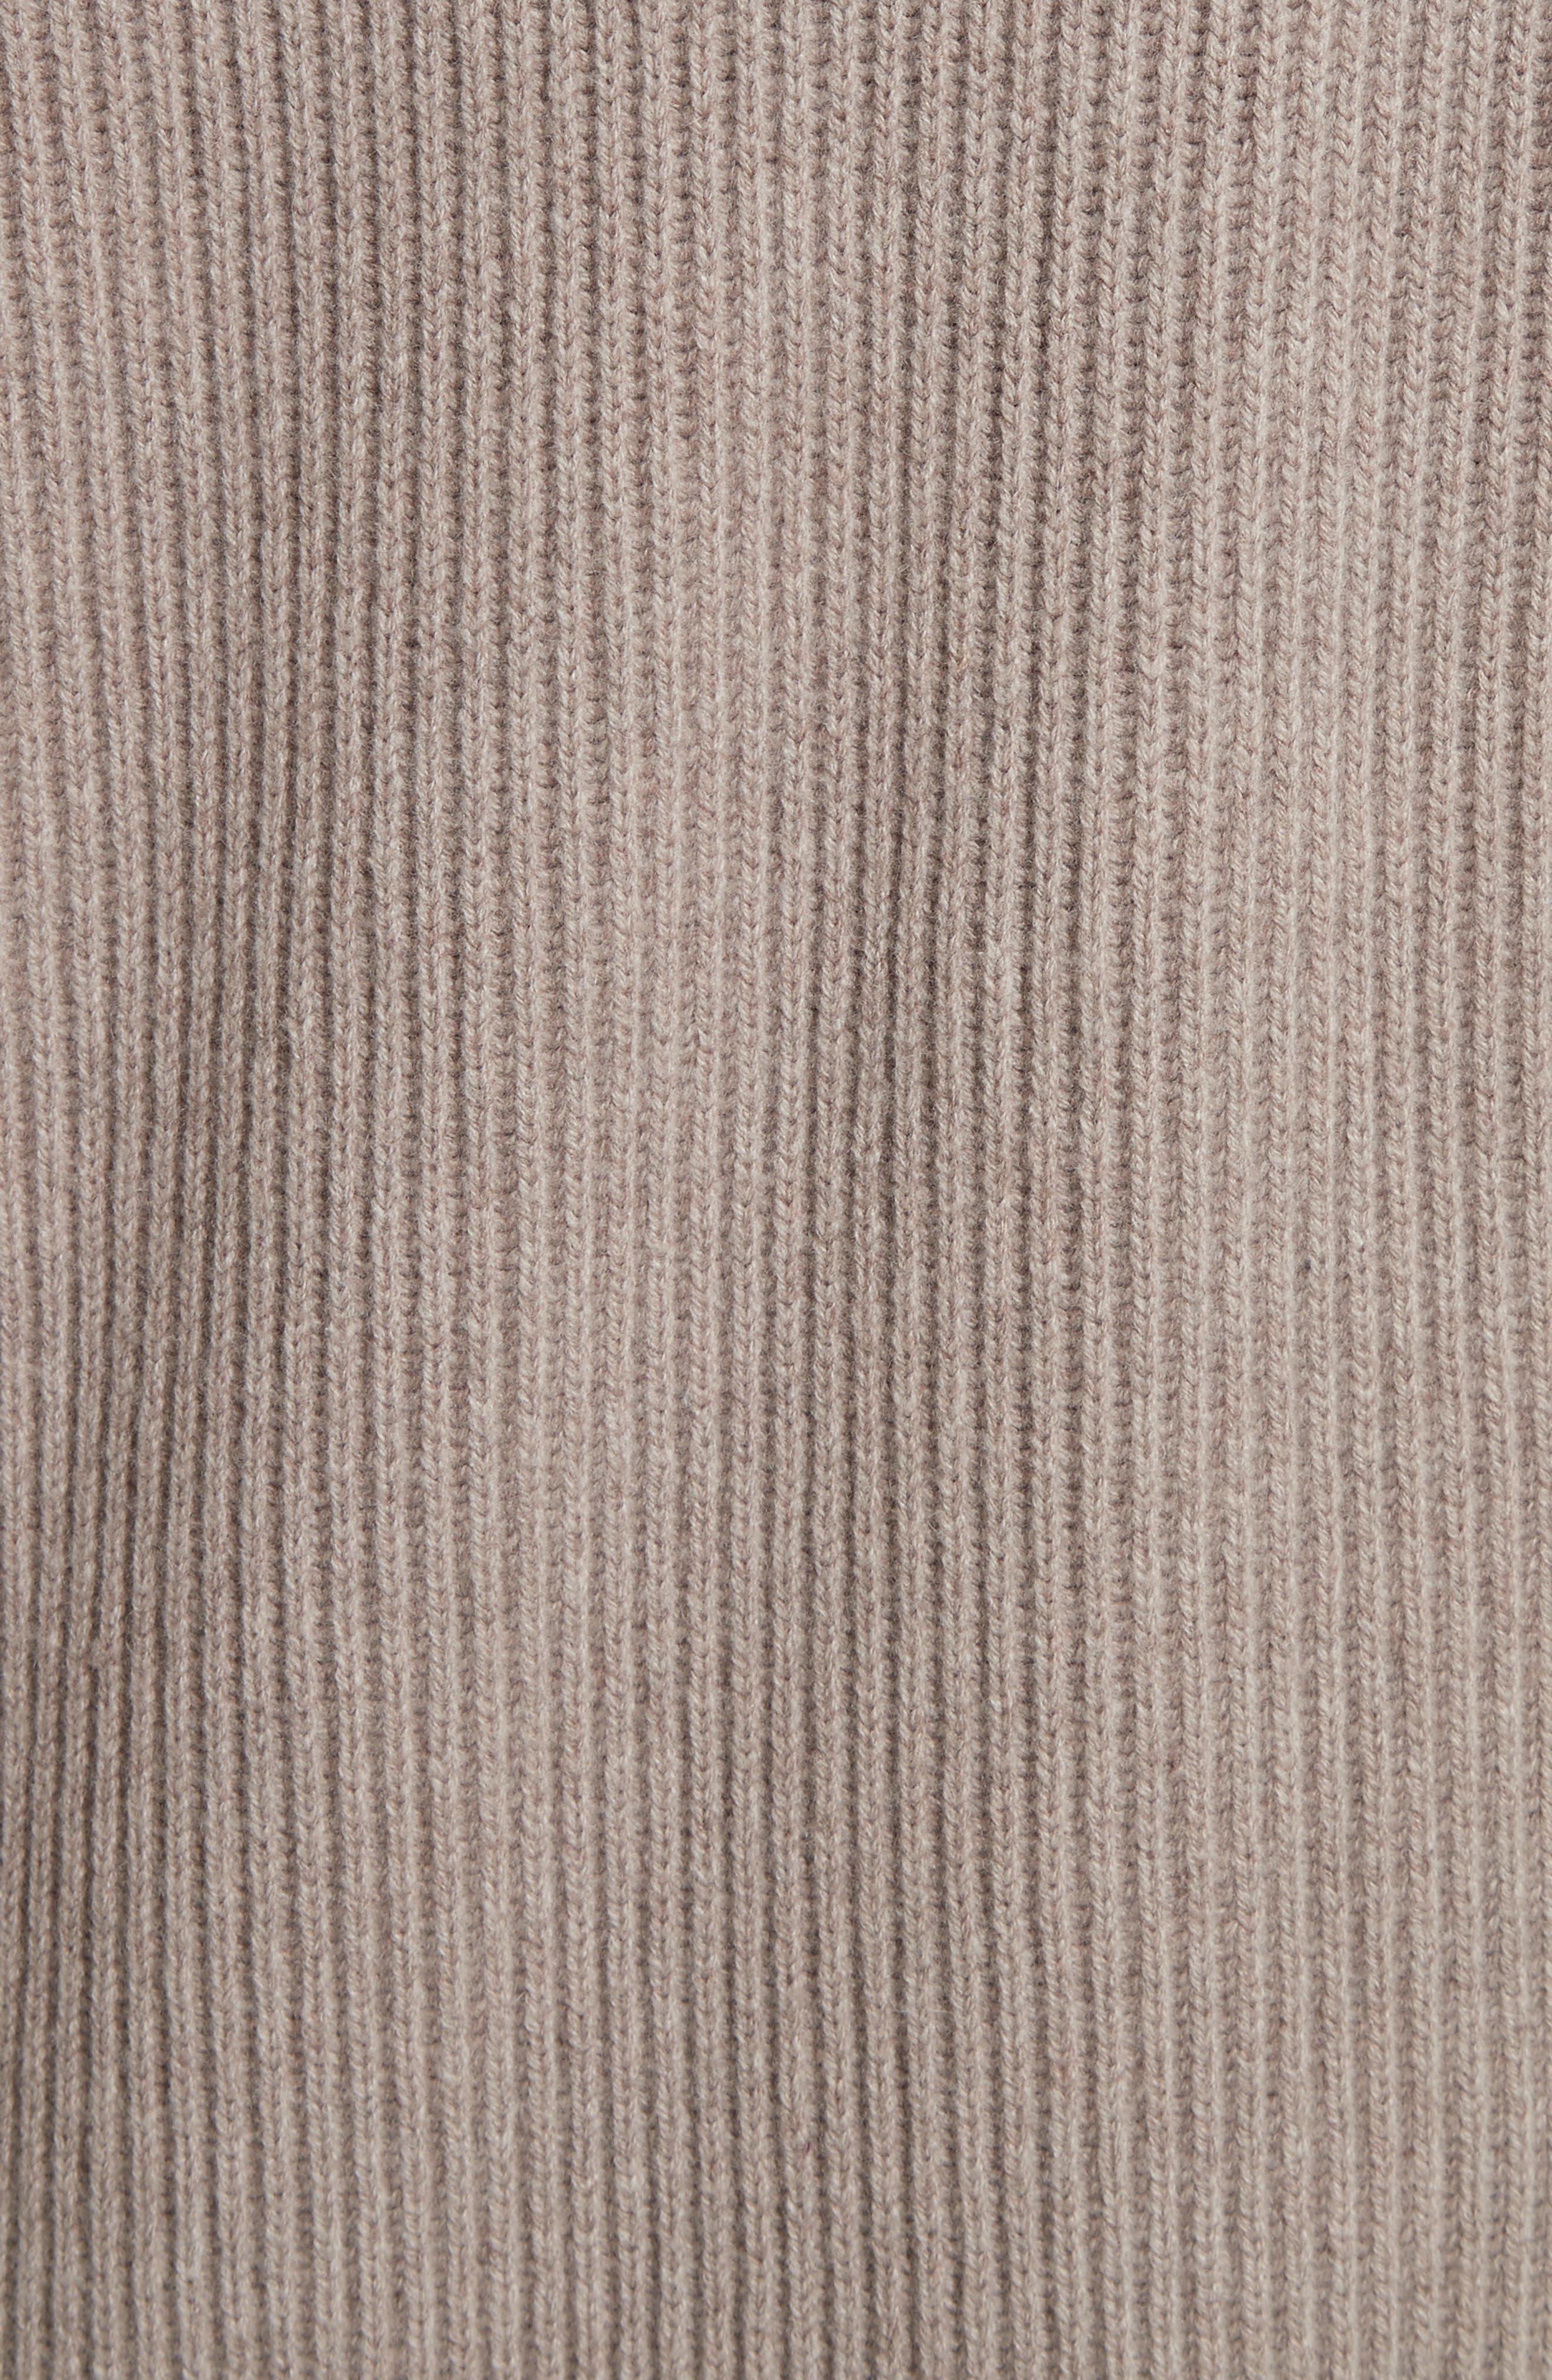 VINCE,                             Long Knit Sweater Robe,                             Alternate thumbnail 5, color,                             260